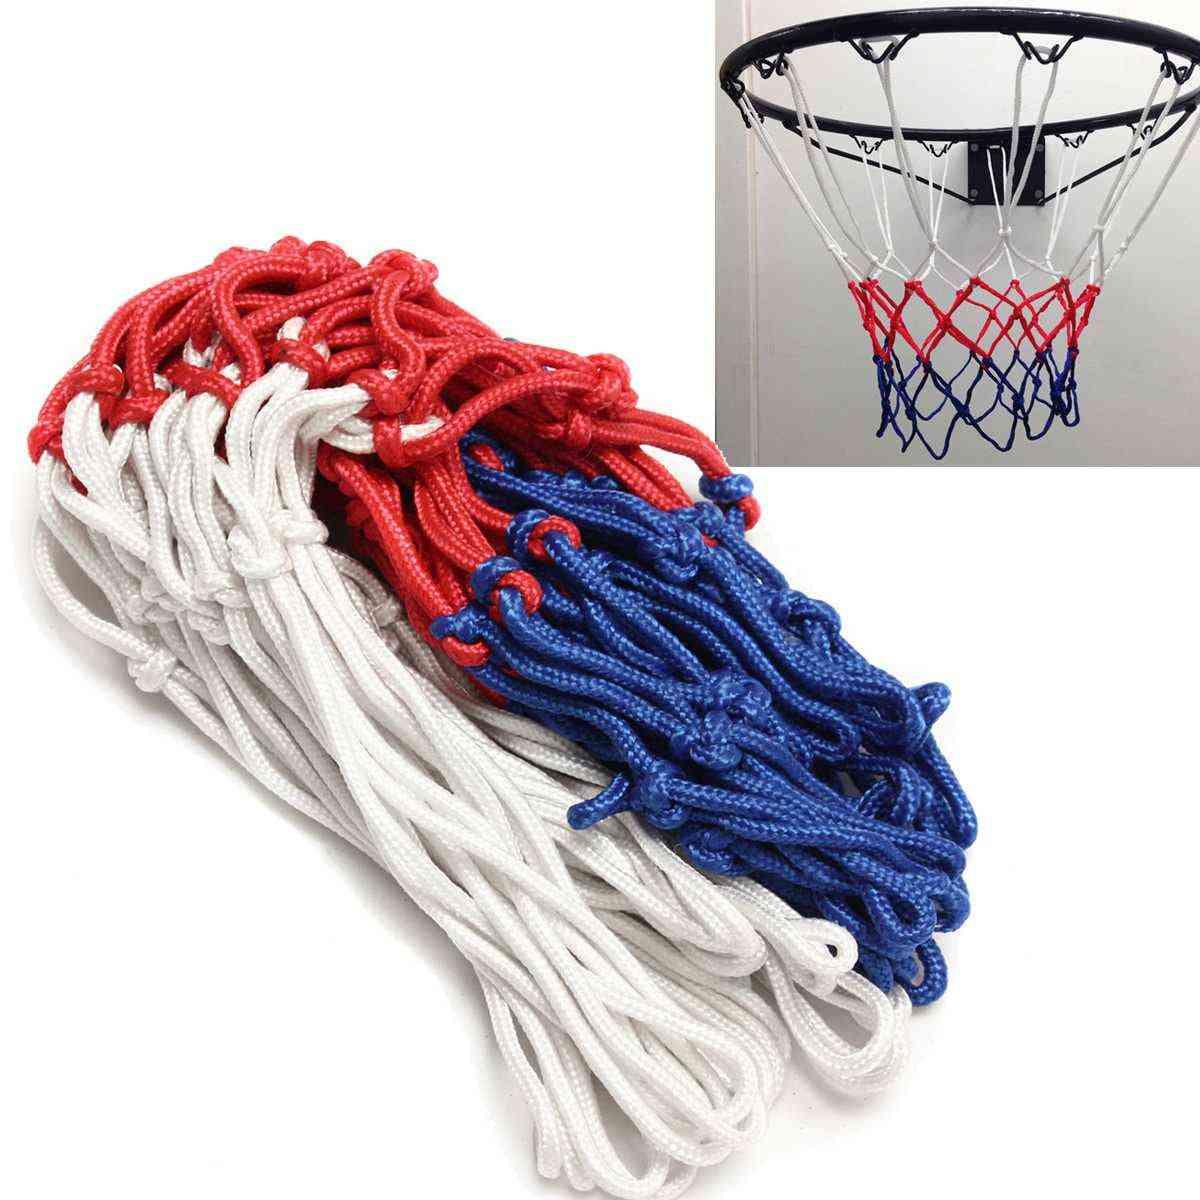 Basketball Rim Mesh Net, Durable Heavy Duty Nylon Hoop Goal Fits Standard